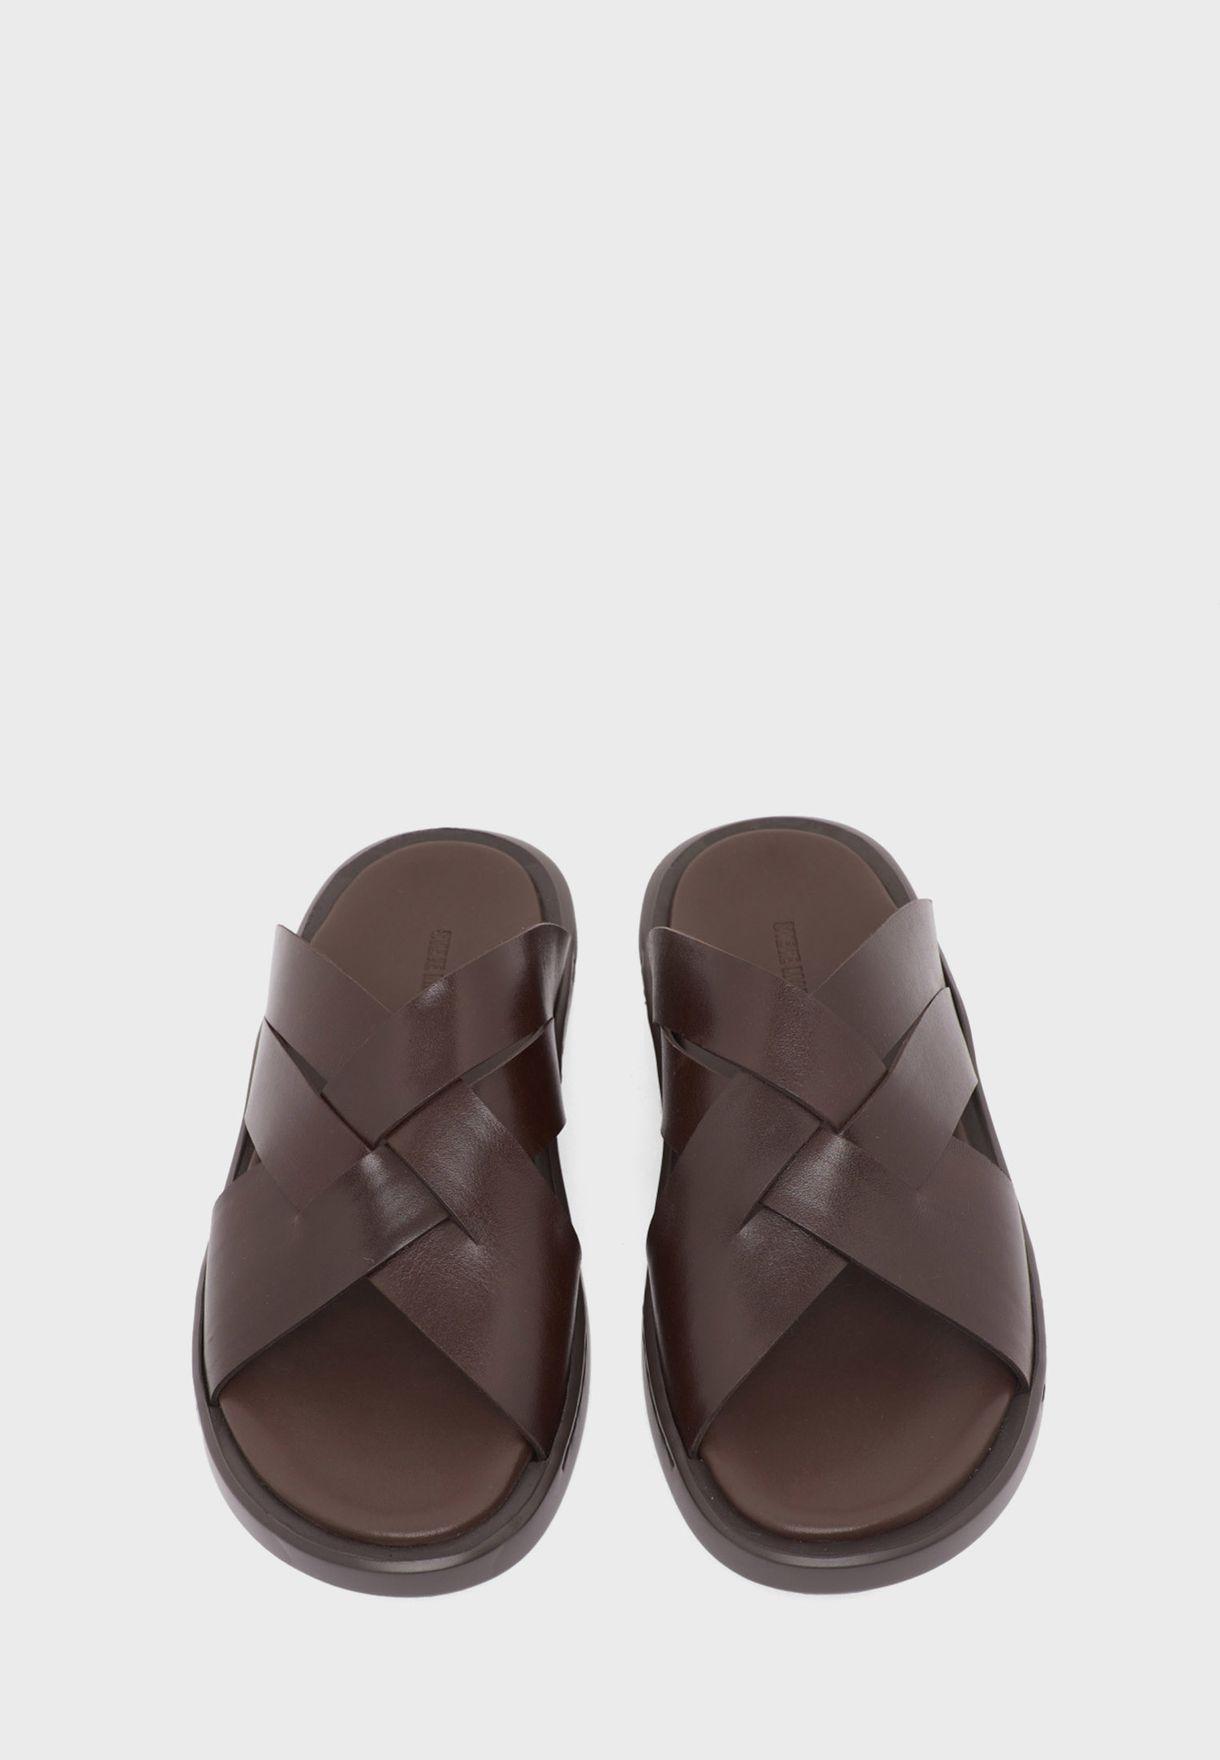 N-Classic Cross Strap Sandal